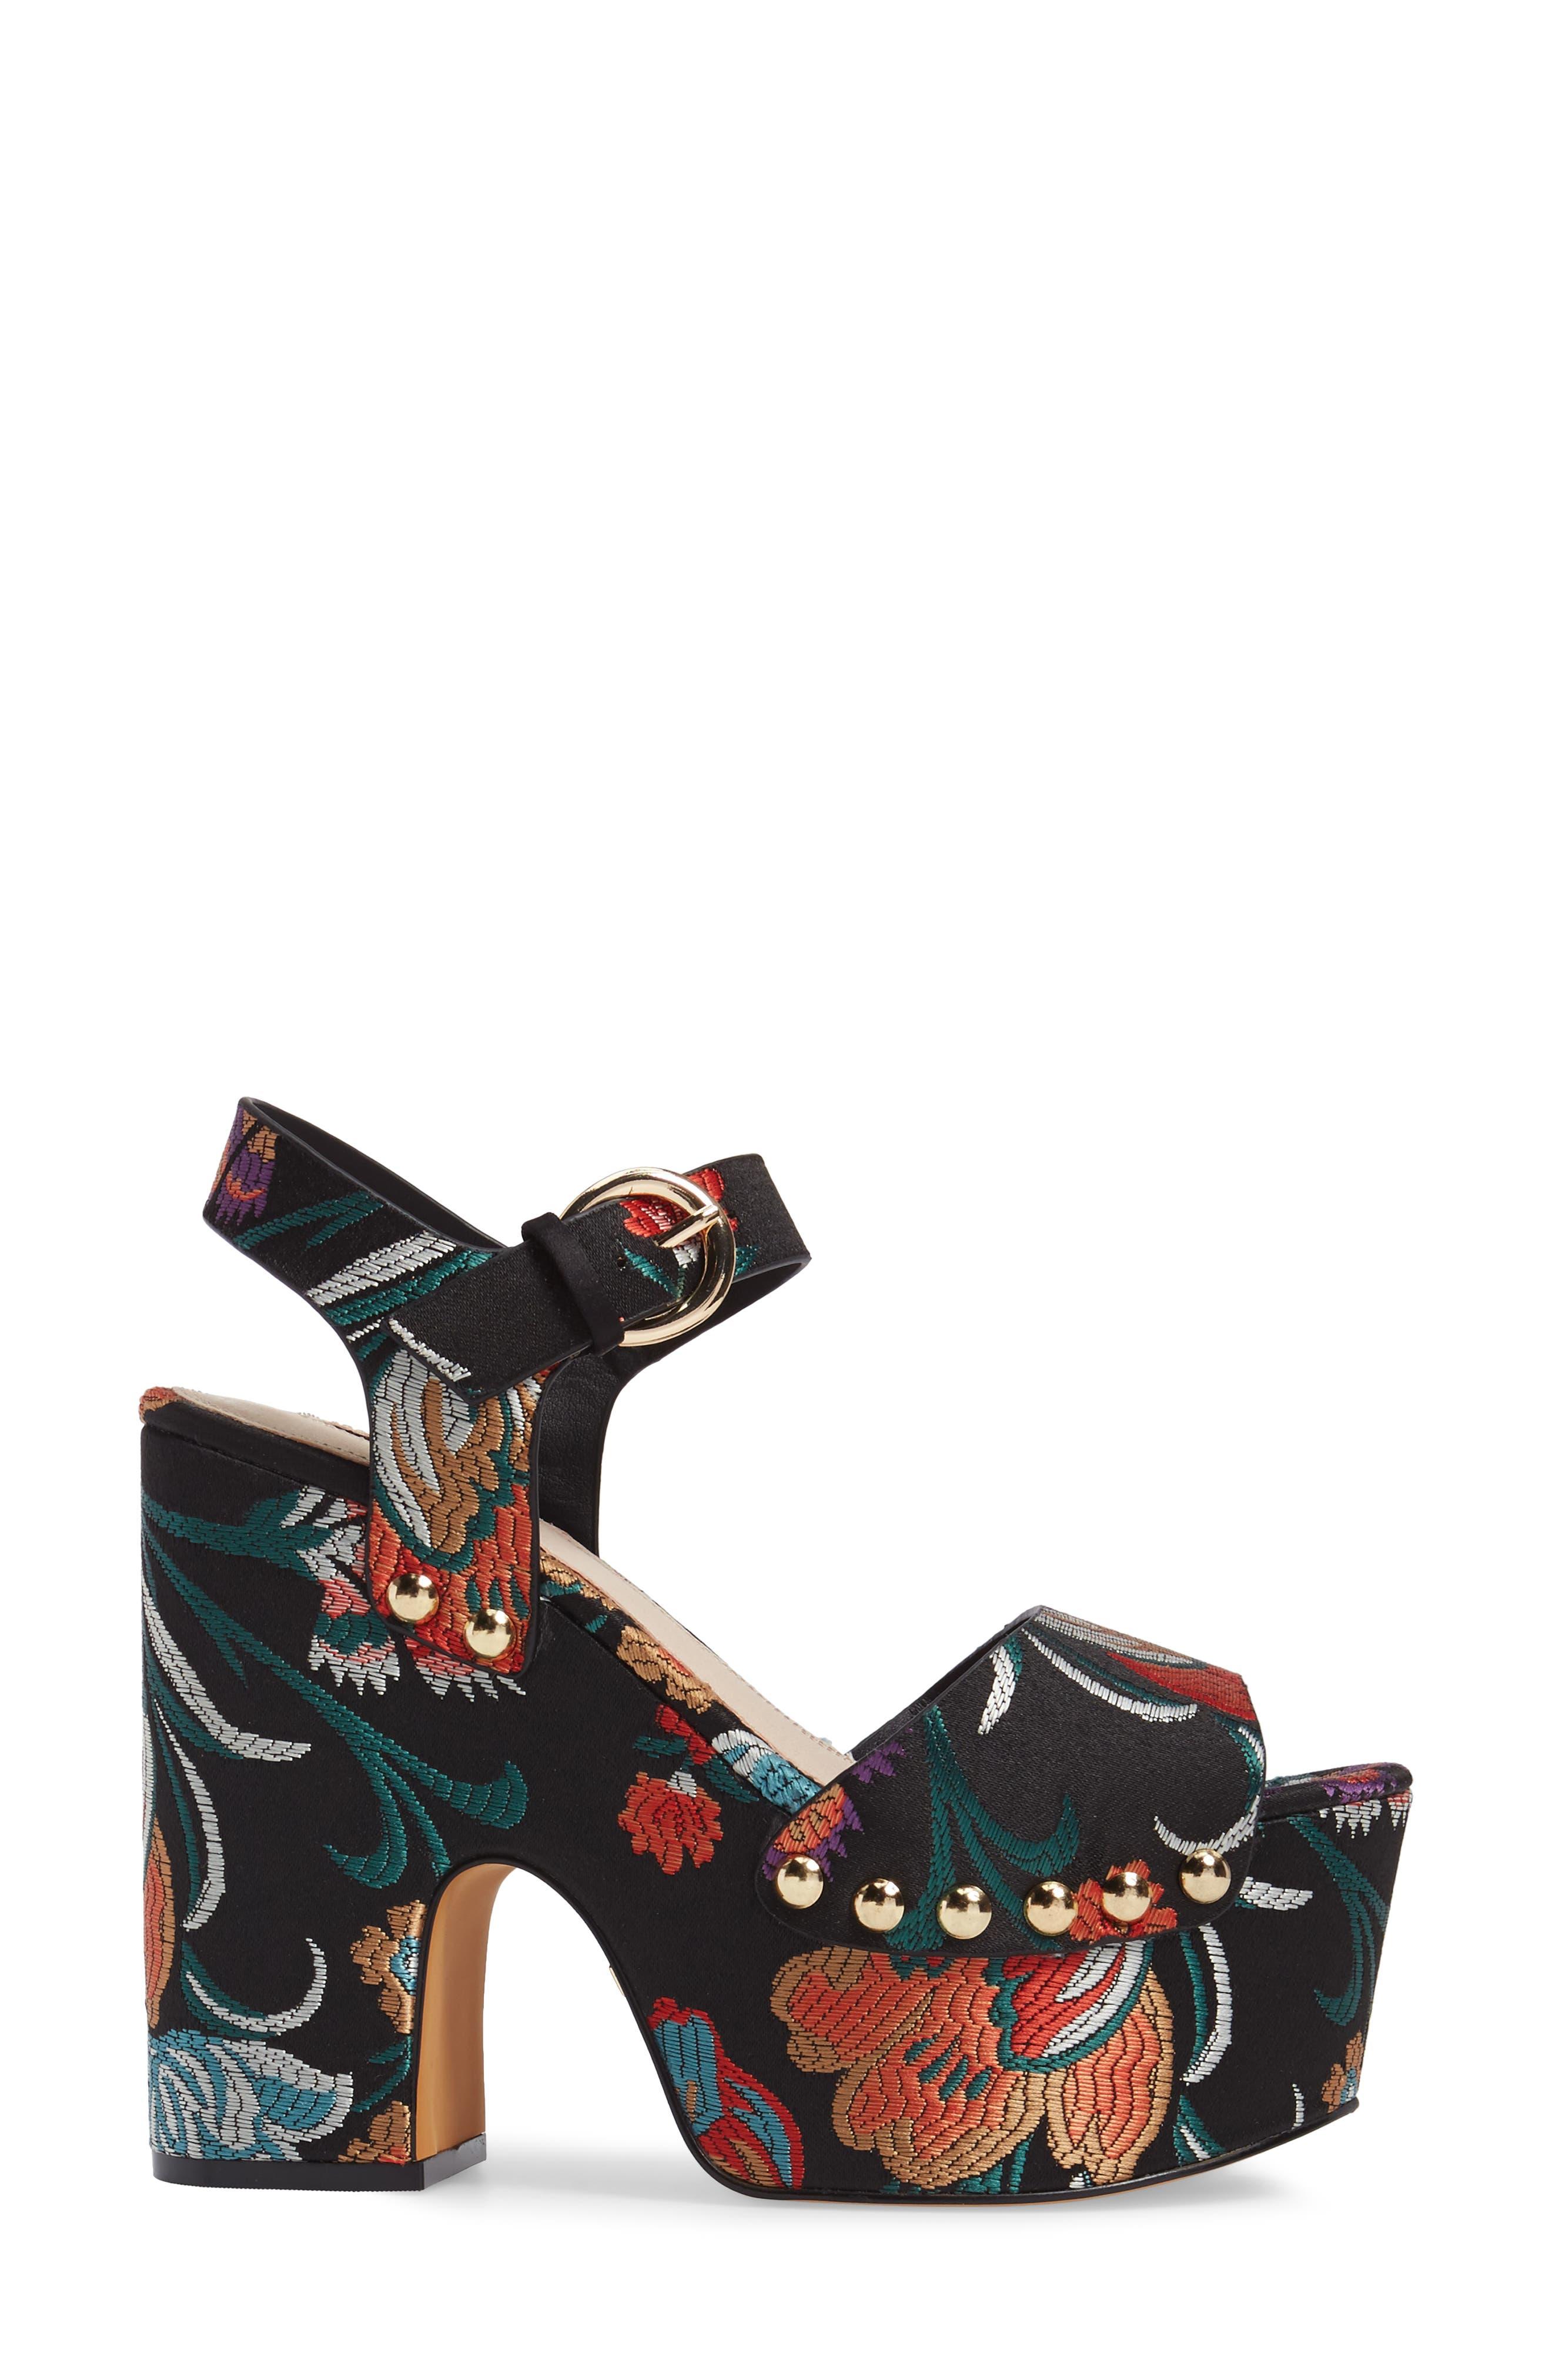 Lourdes Embroidered Platform Sandal,                             Alternate thumbnail 3, color,                             001